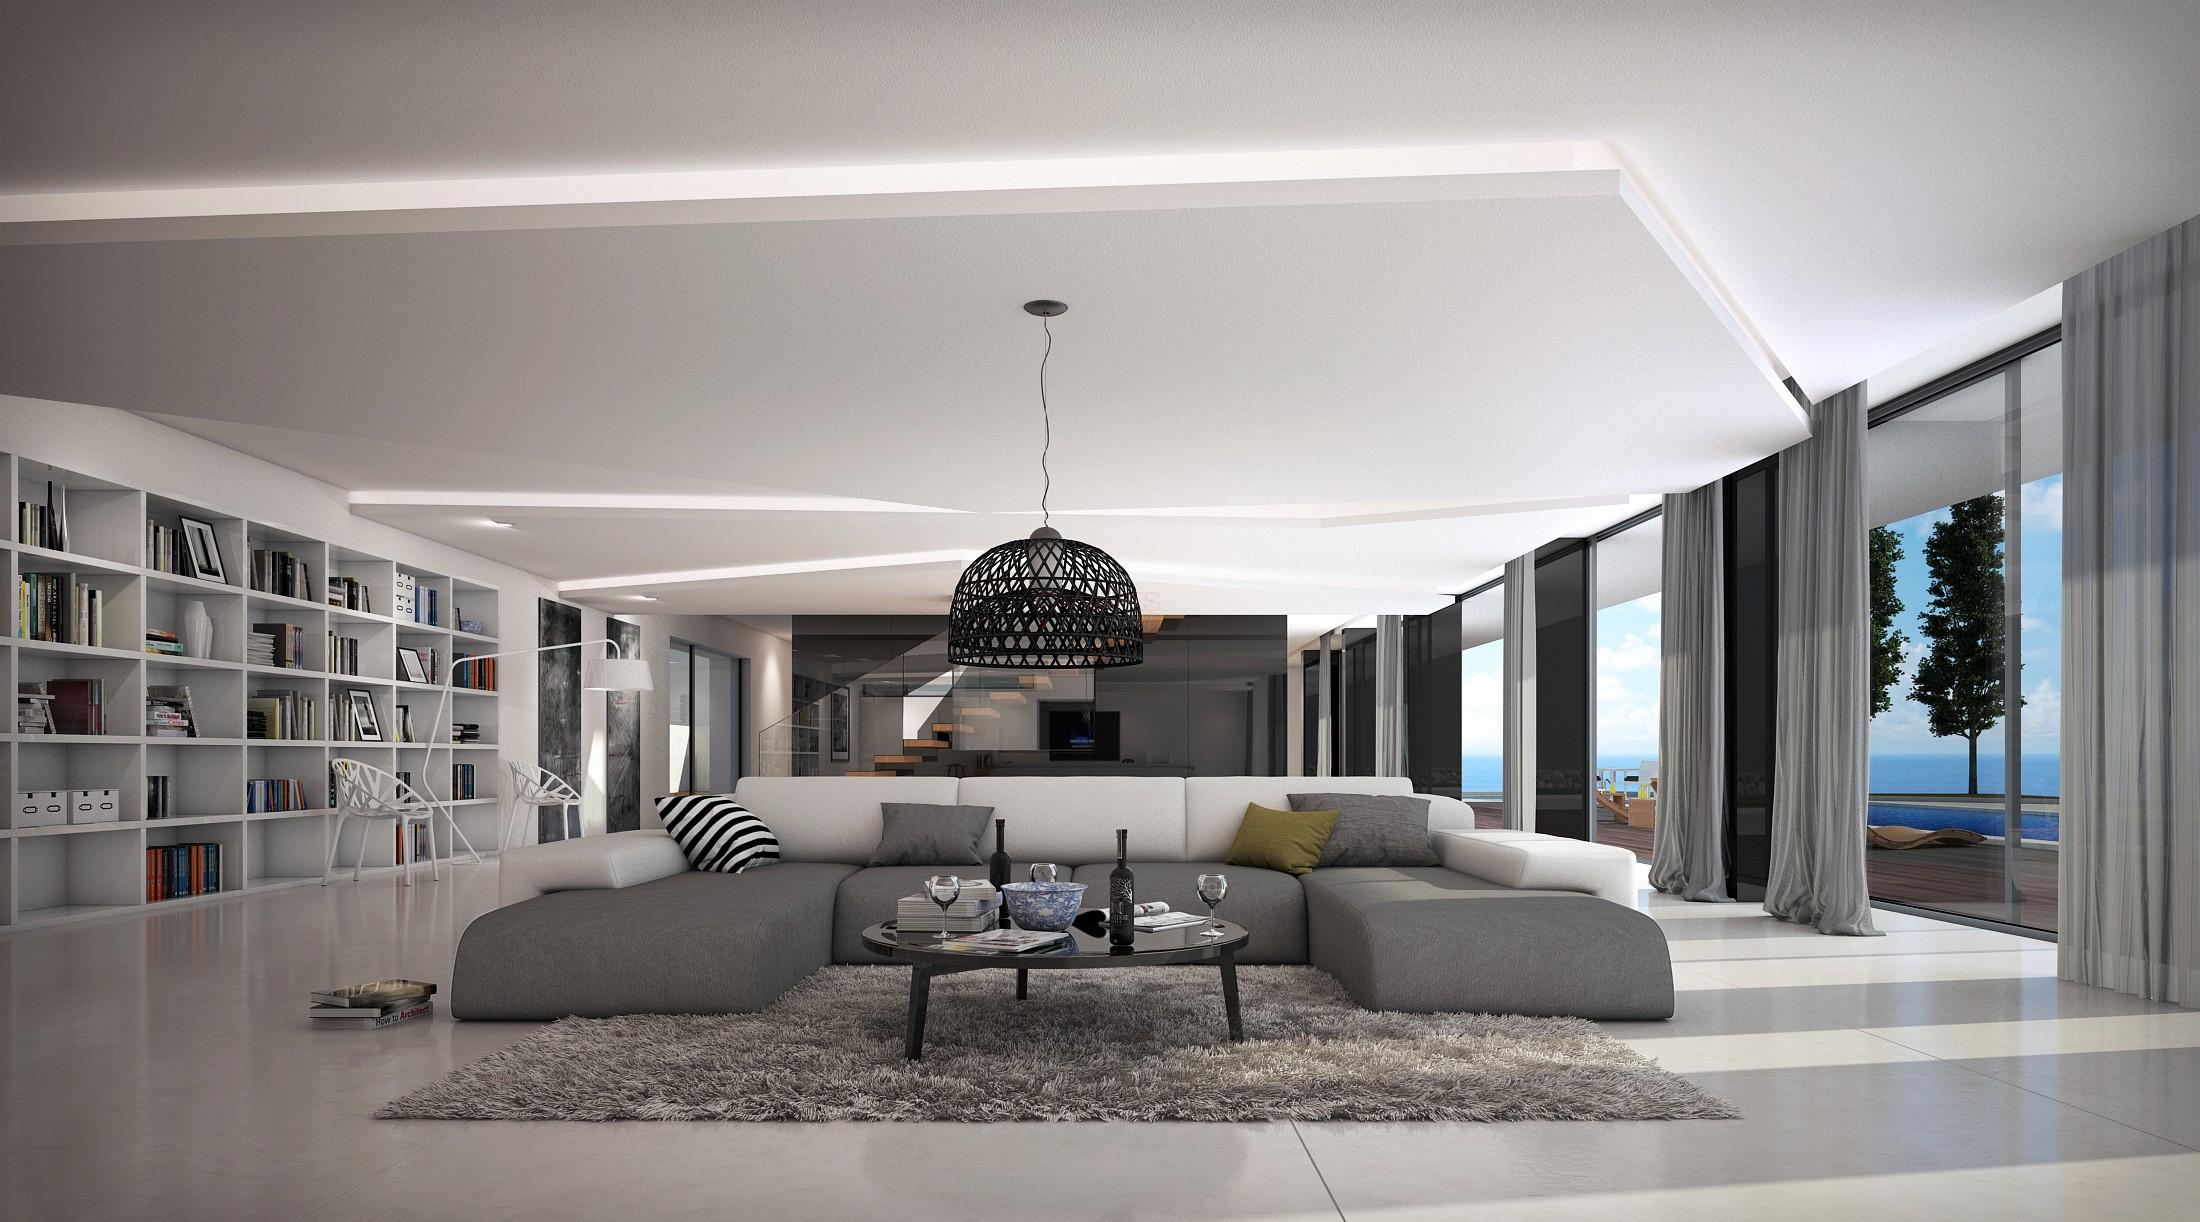 Grand Canapé D'angle Design Bapa Large, 1 689,00 € pour Grand Canape Panoramique